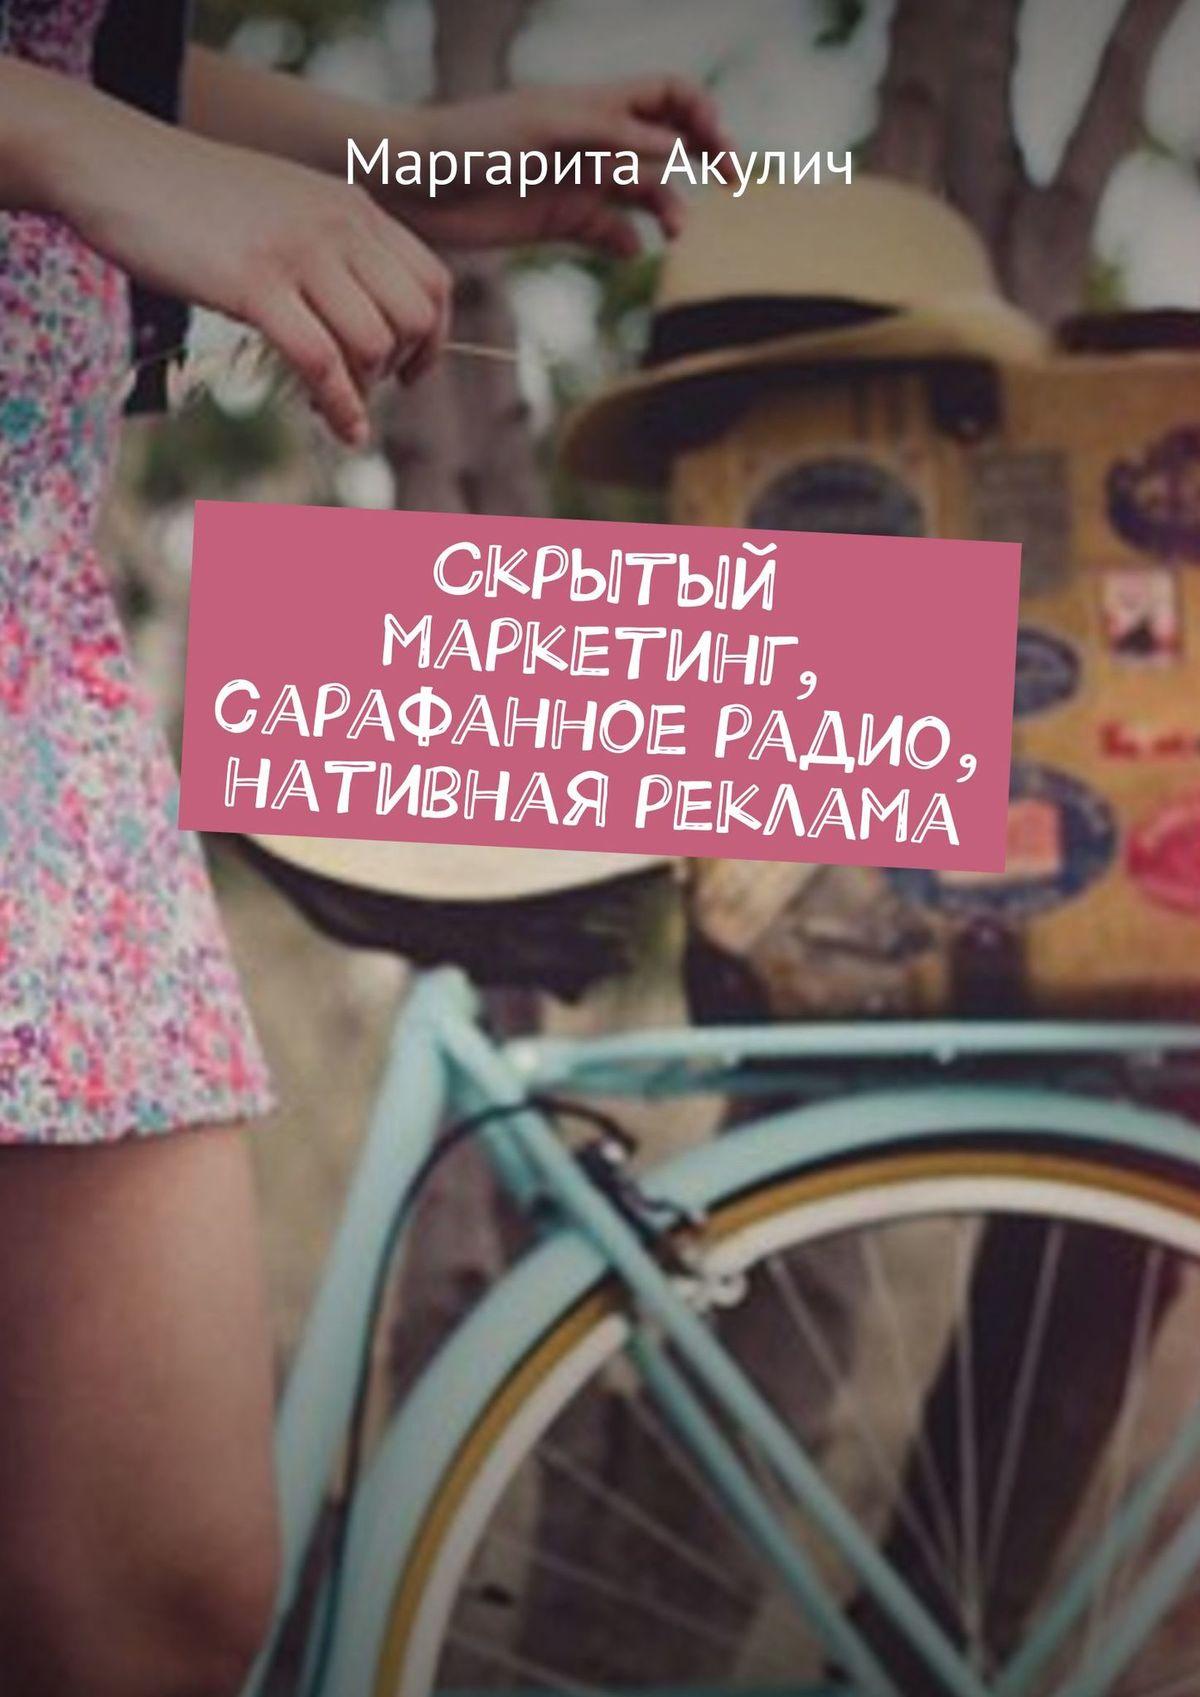 Маргарита Акулич Скрытый маркетинг, сарафанное радио, нативная реклама маргарита акулич контекстная реклама имаркетинг контента